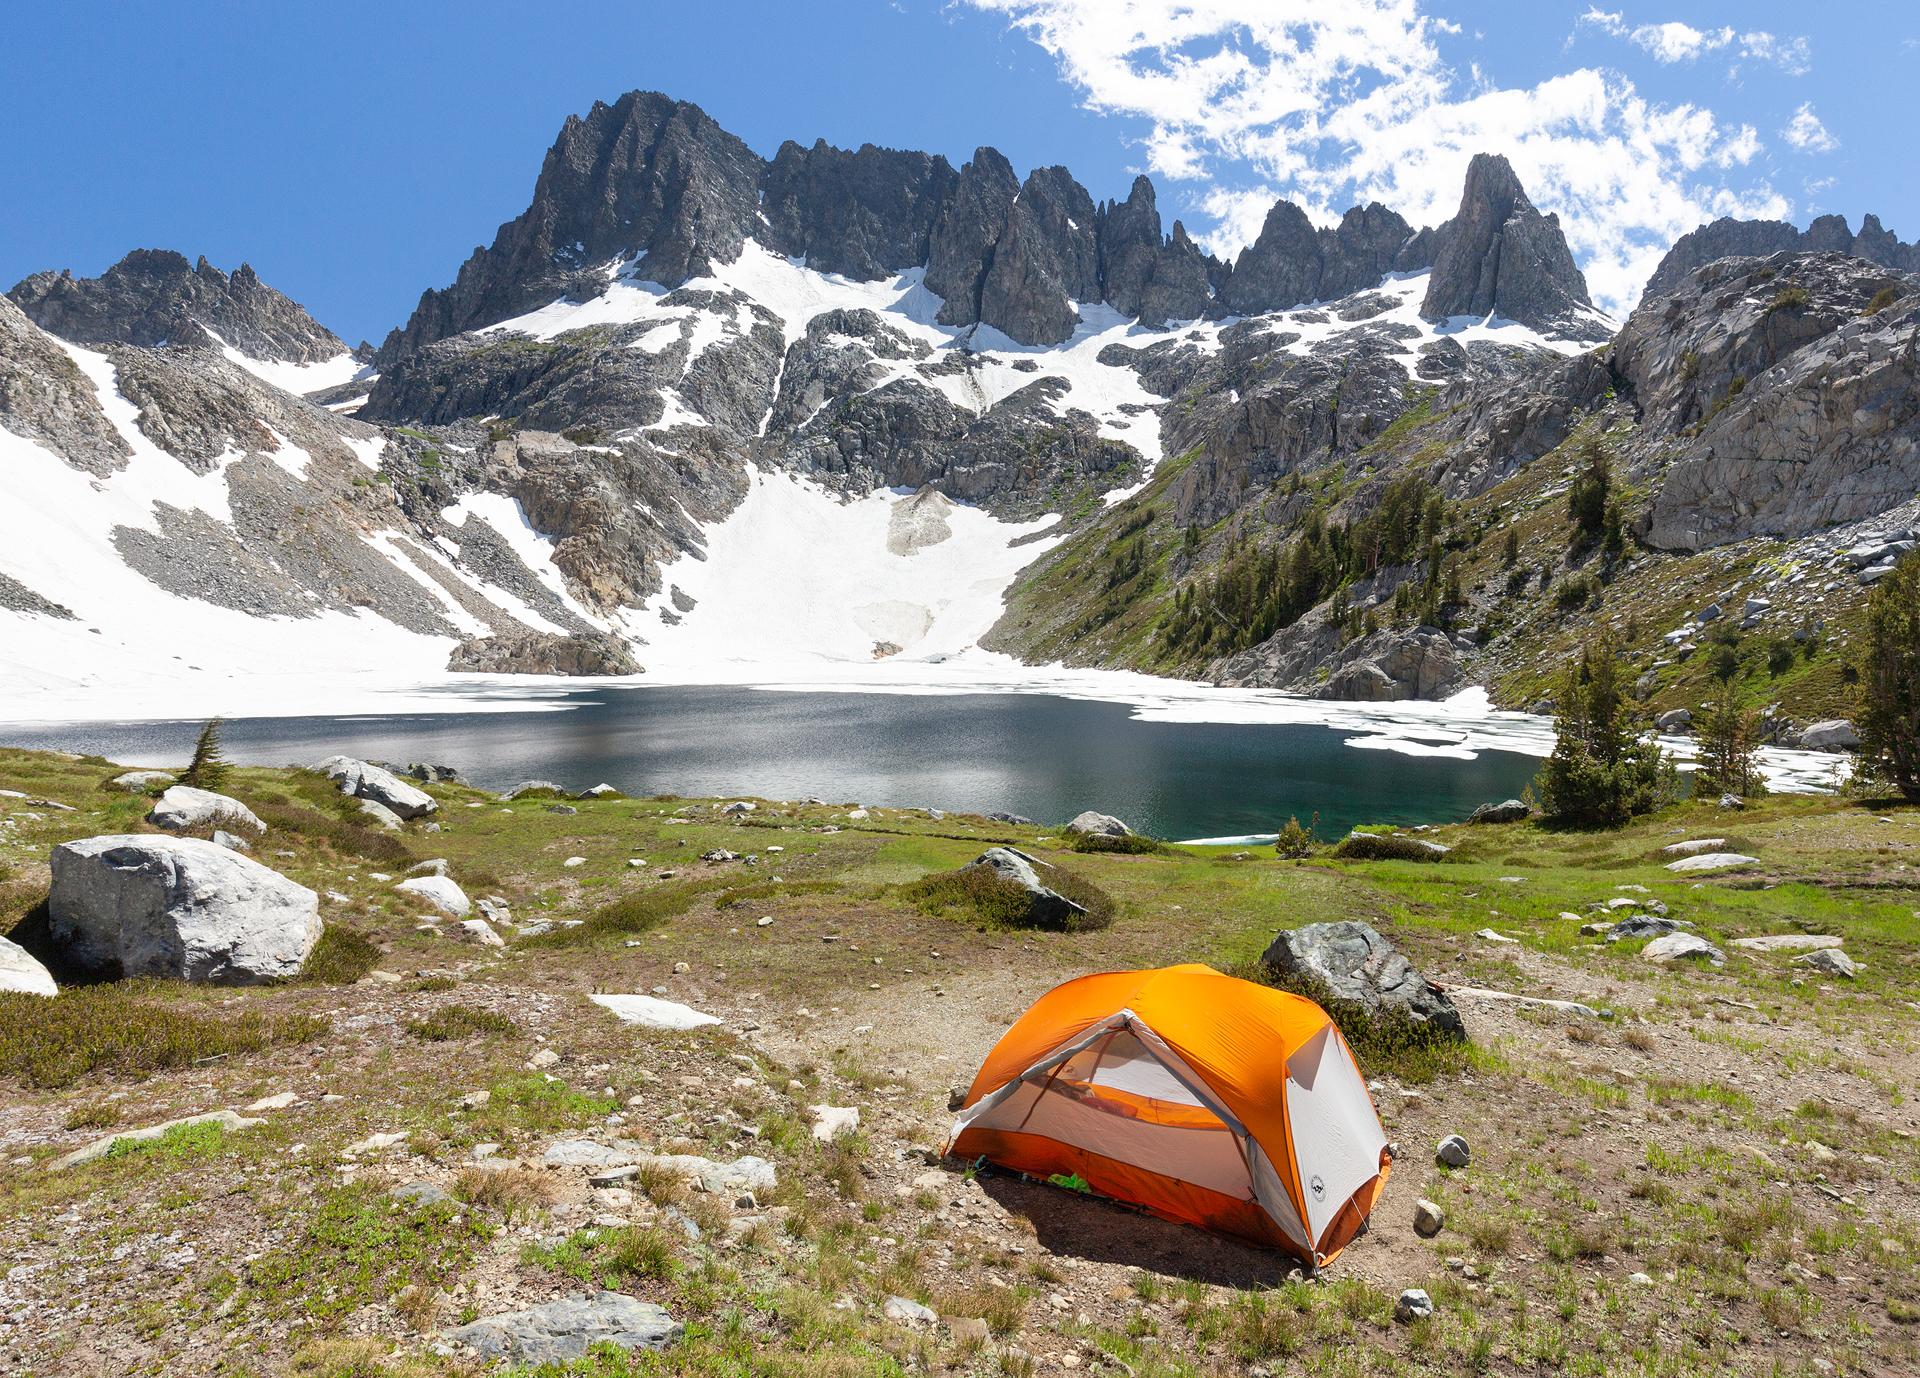 Camp at Iceberg Lake